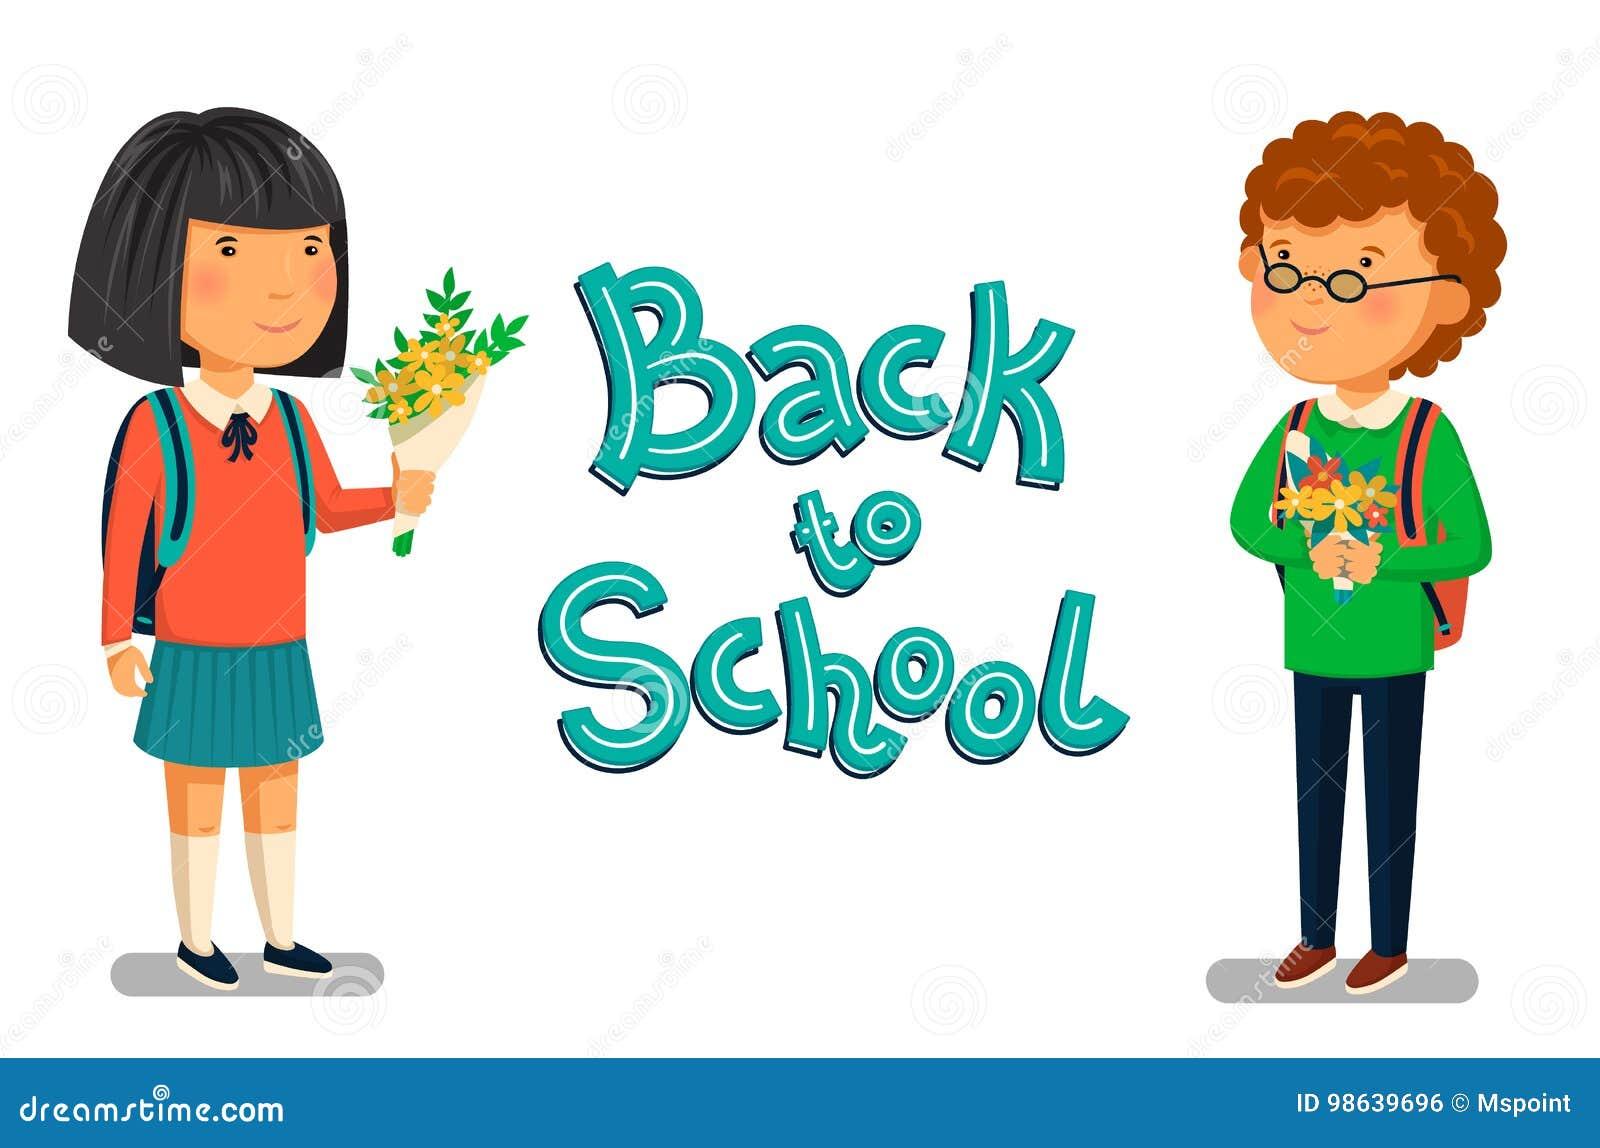 vector schoolboy and schoolgirl with back to school text template